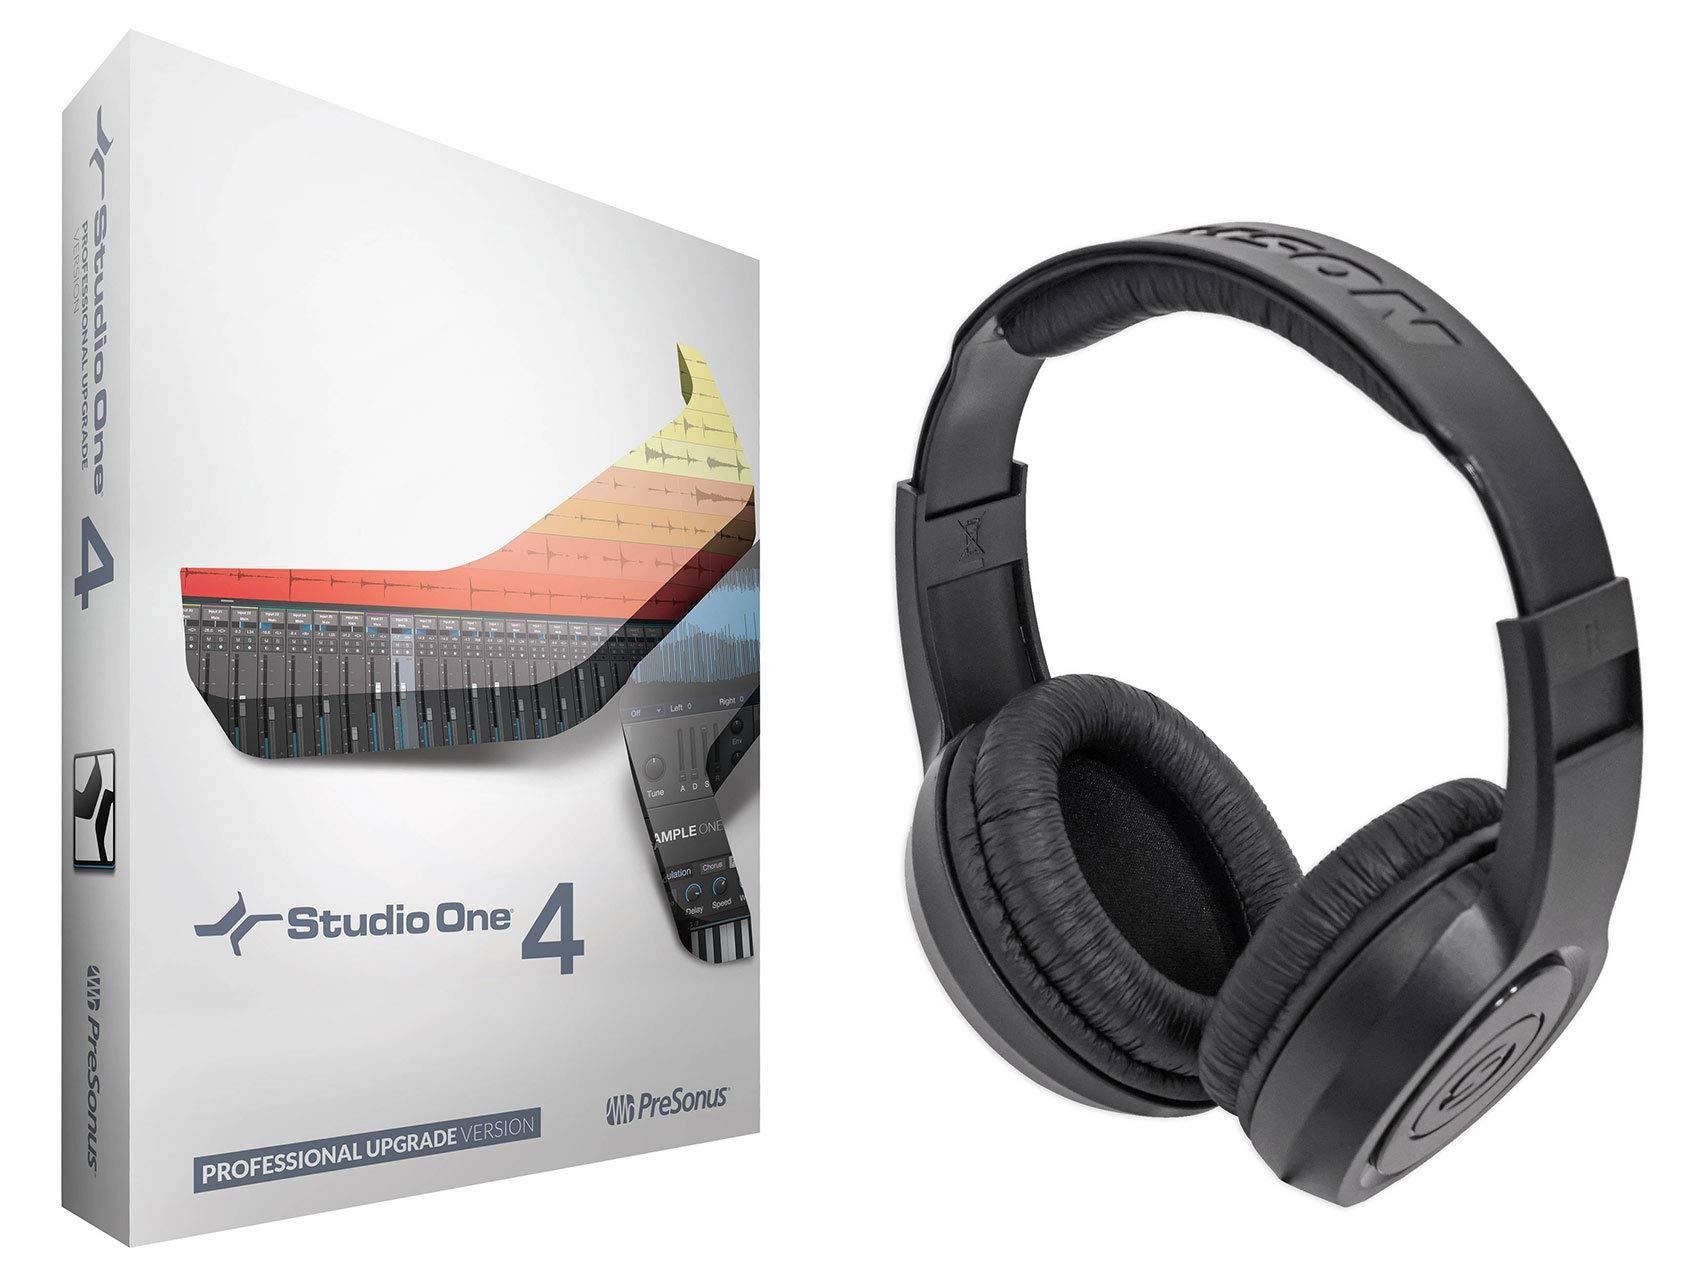 Presonus Studio One Upgrade Artist/Producer Version 1/2/3 to Pro 4.0+Headphones